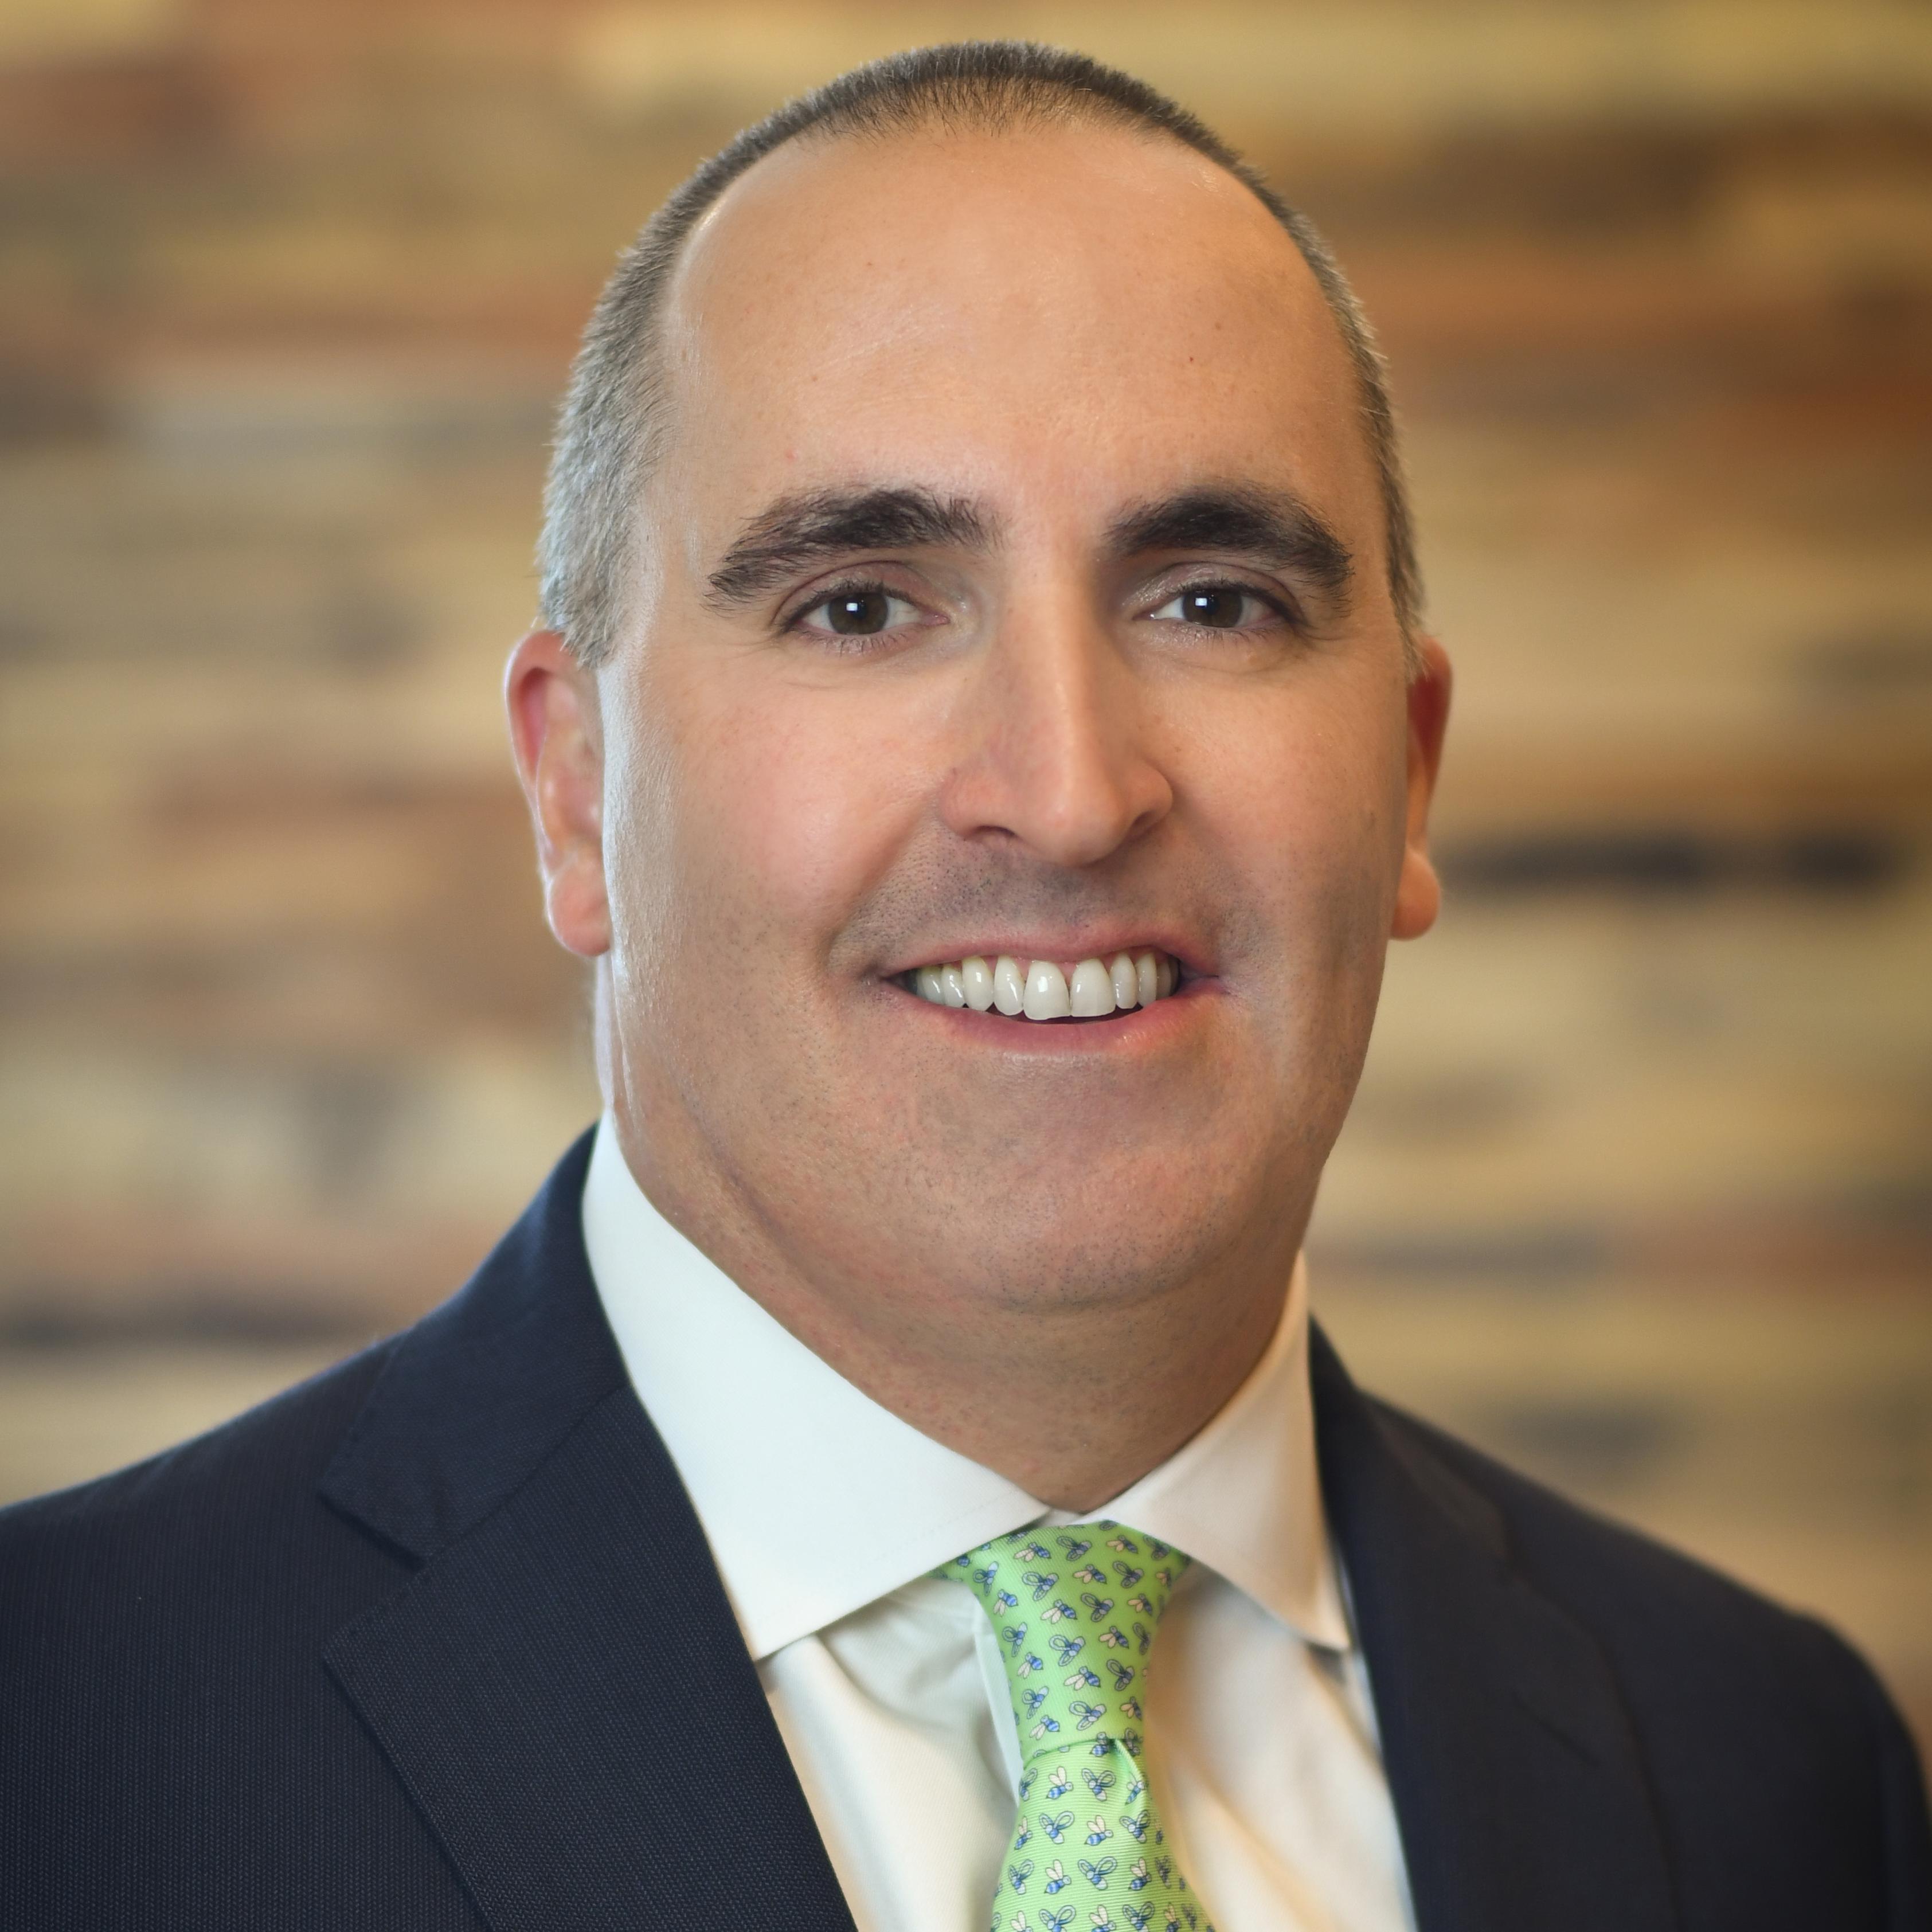 Thomas K. Hagigh, CFP® Profile Photo